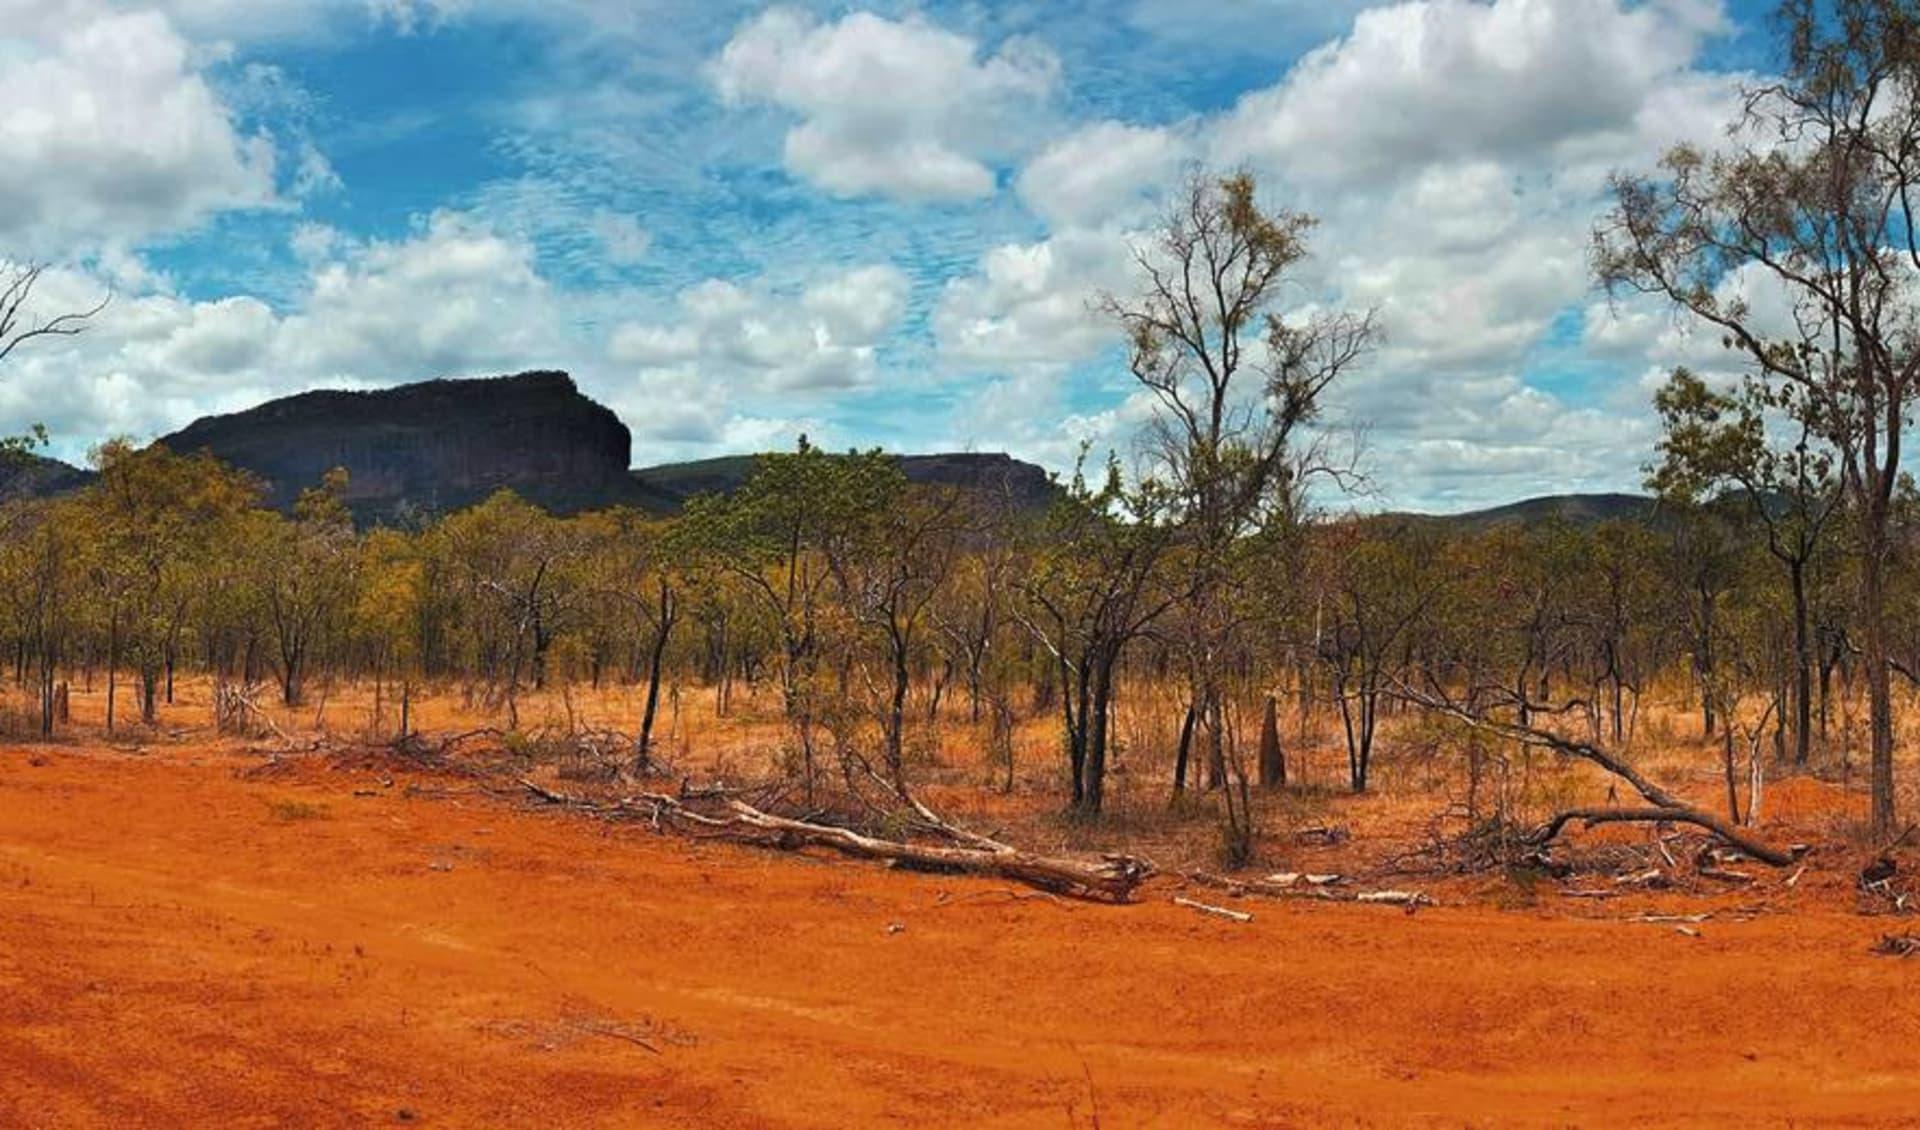 Sails in the Desert Hotel in Ayers Rock - Yulara: Natur Northern Territory Australien  Outback Landschaft  c shutterstock_560722195 2017